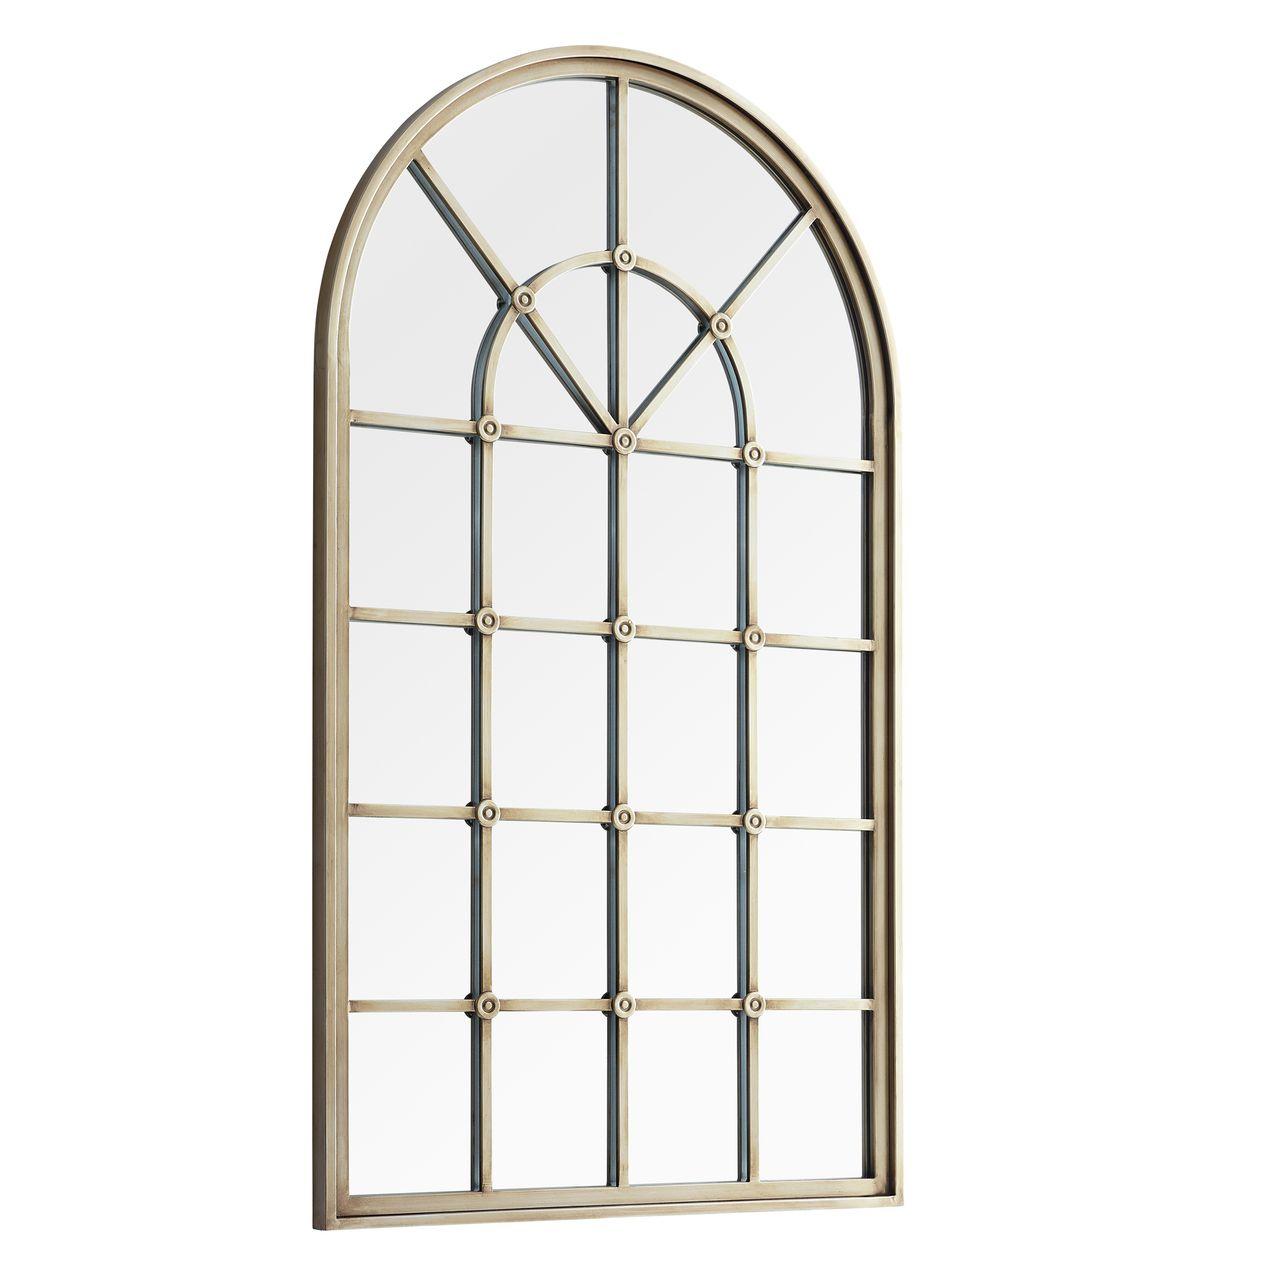 "Walker Edison 50"" Arched Windowpane Mirror - Antique Pewter"